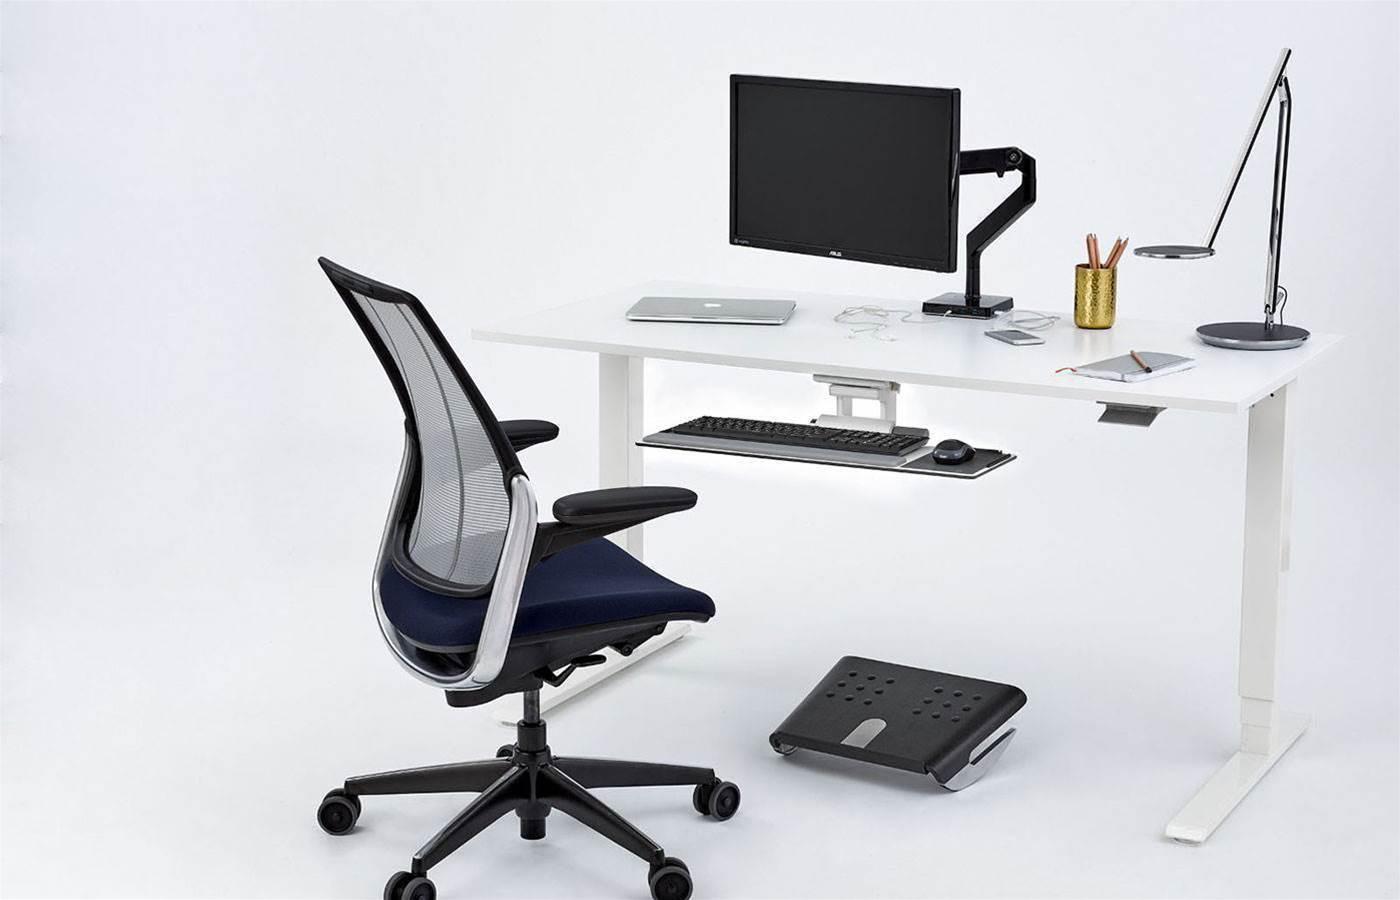 Sektor adds ergonomic office furniture vendor Humanscale to portfolio